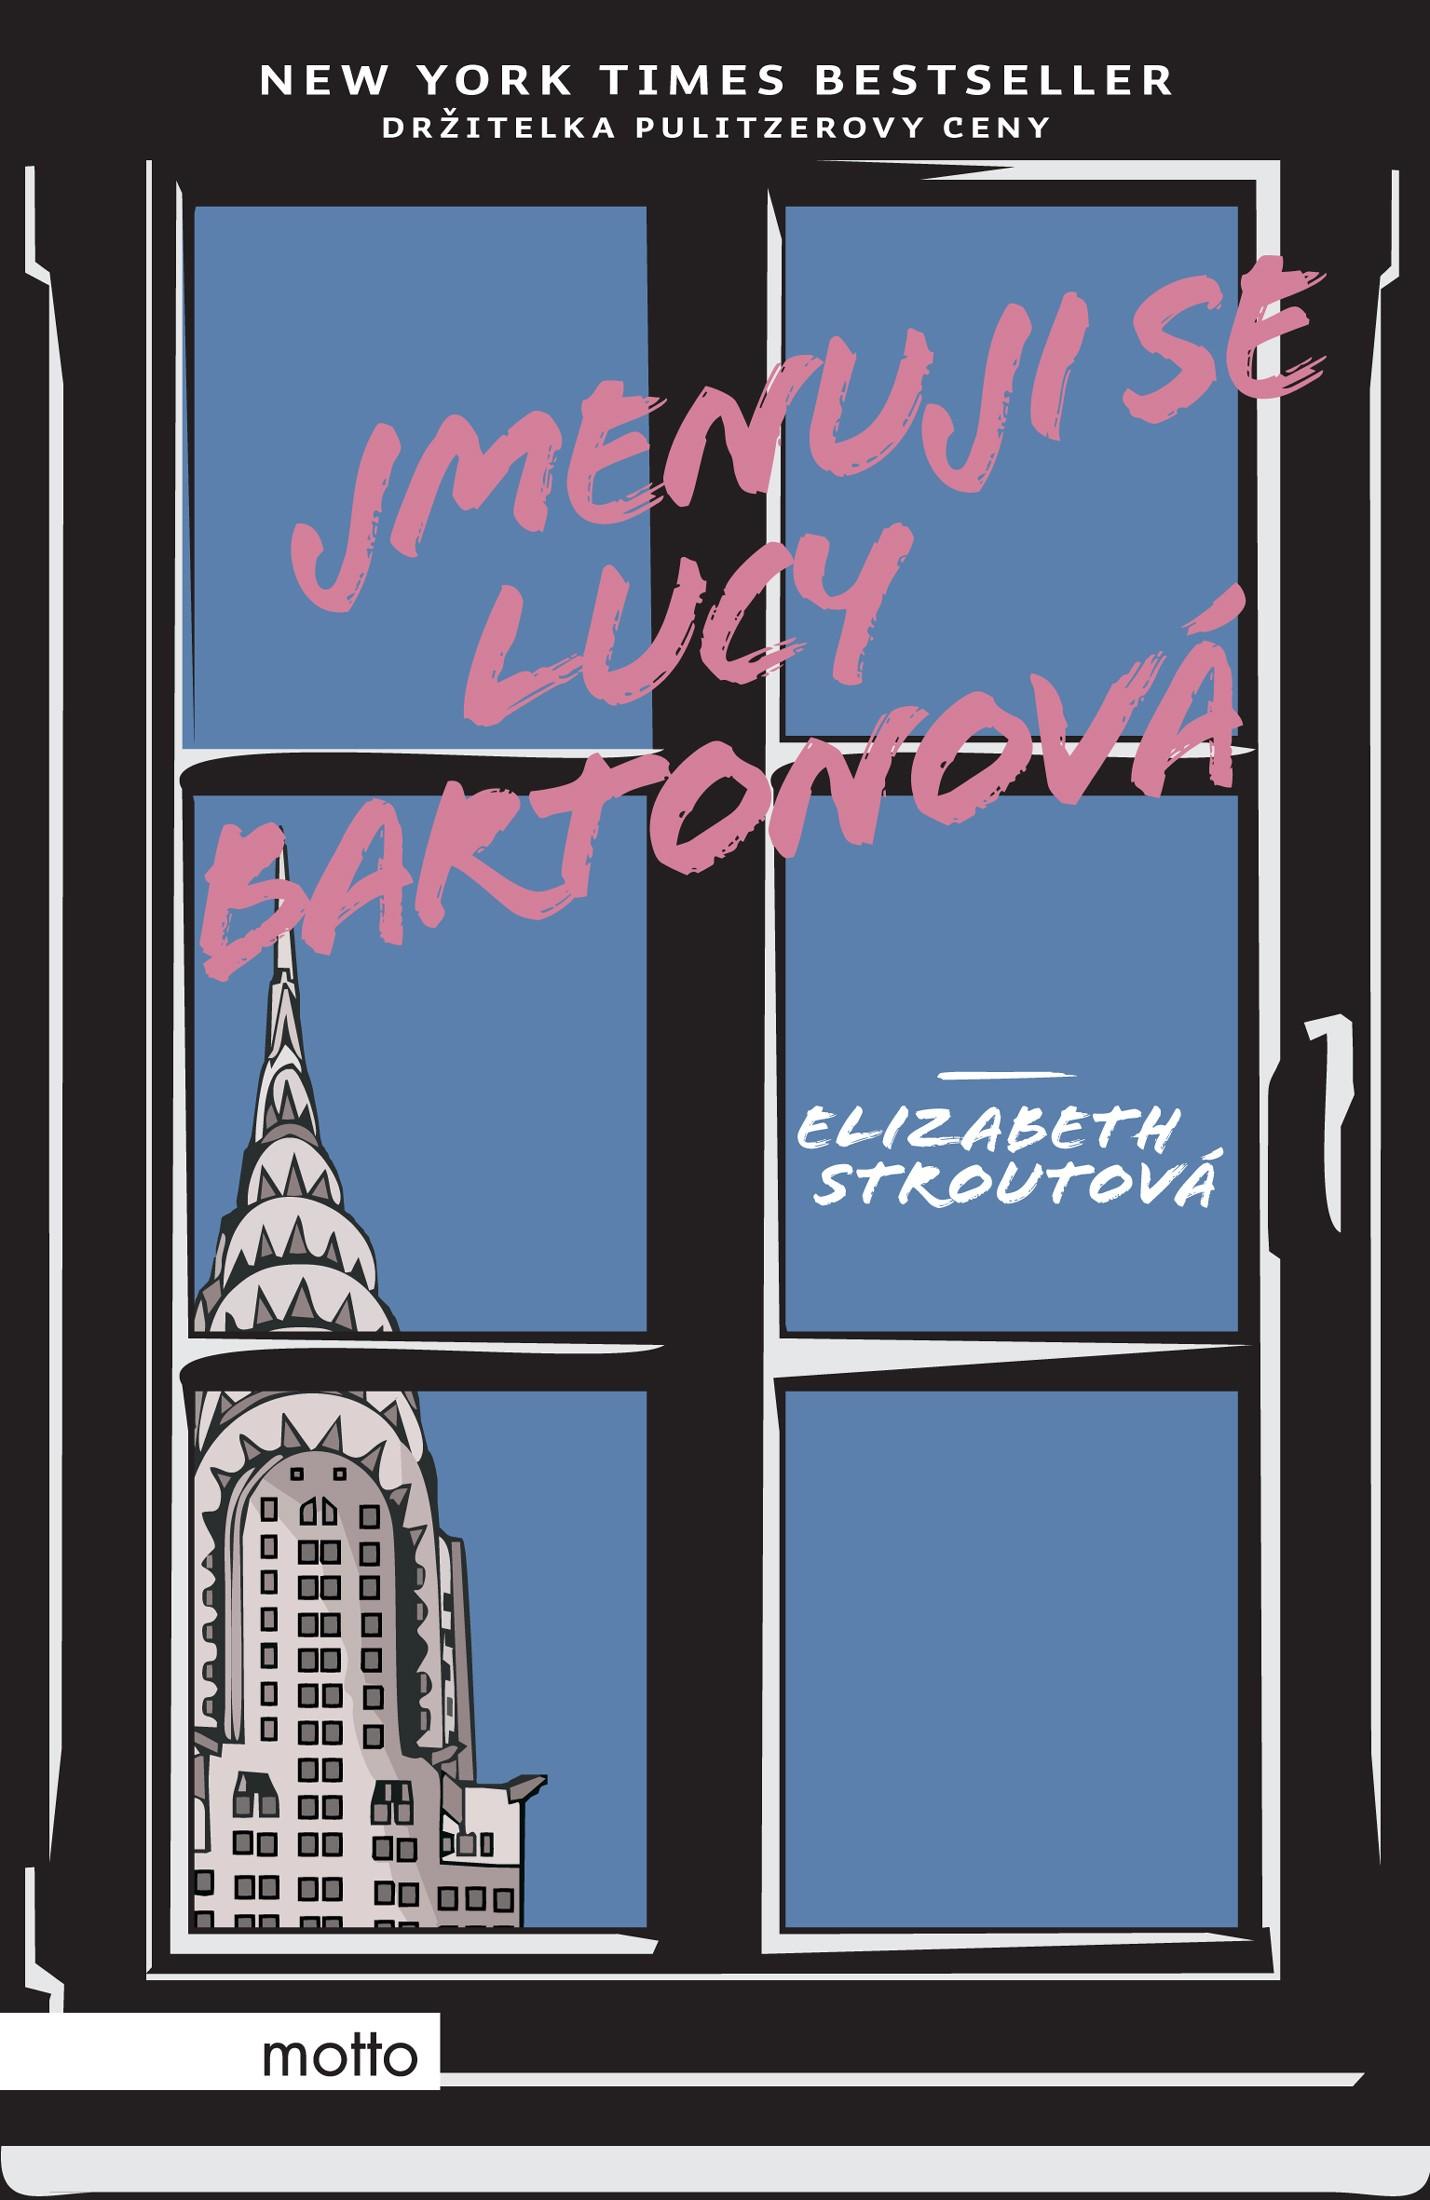 Jmenuji se Lucy Bartonová